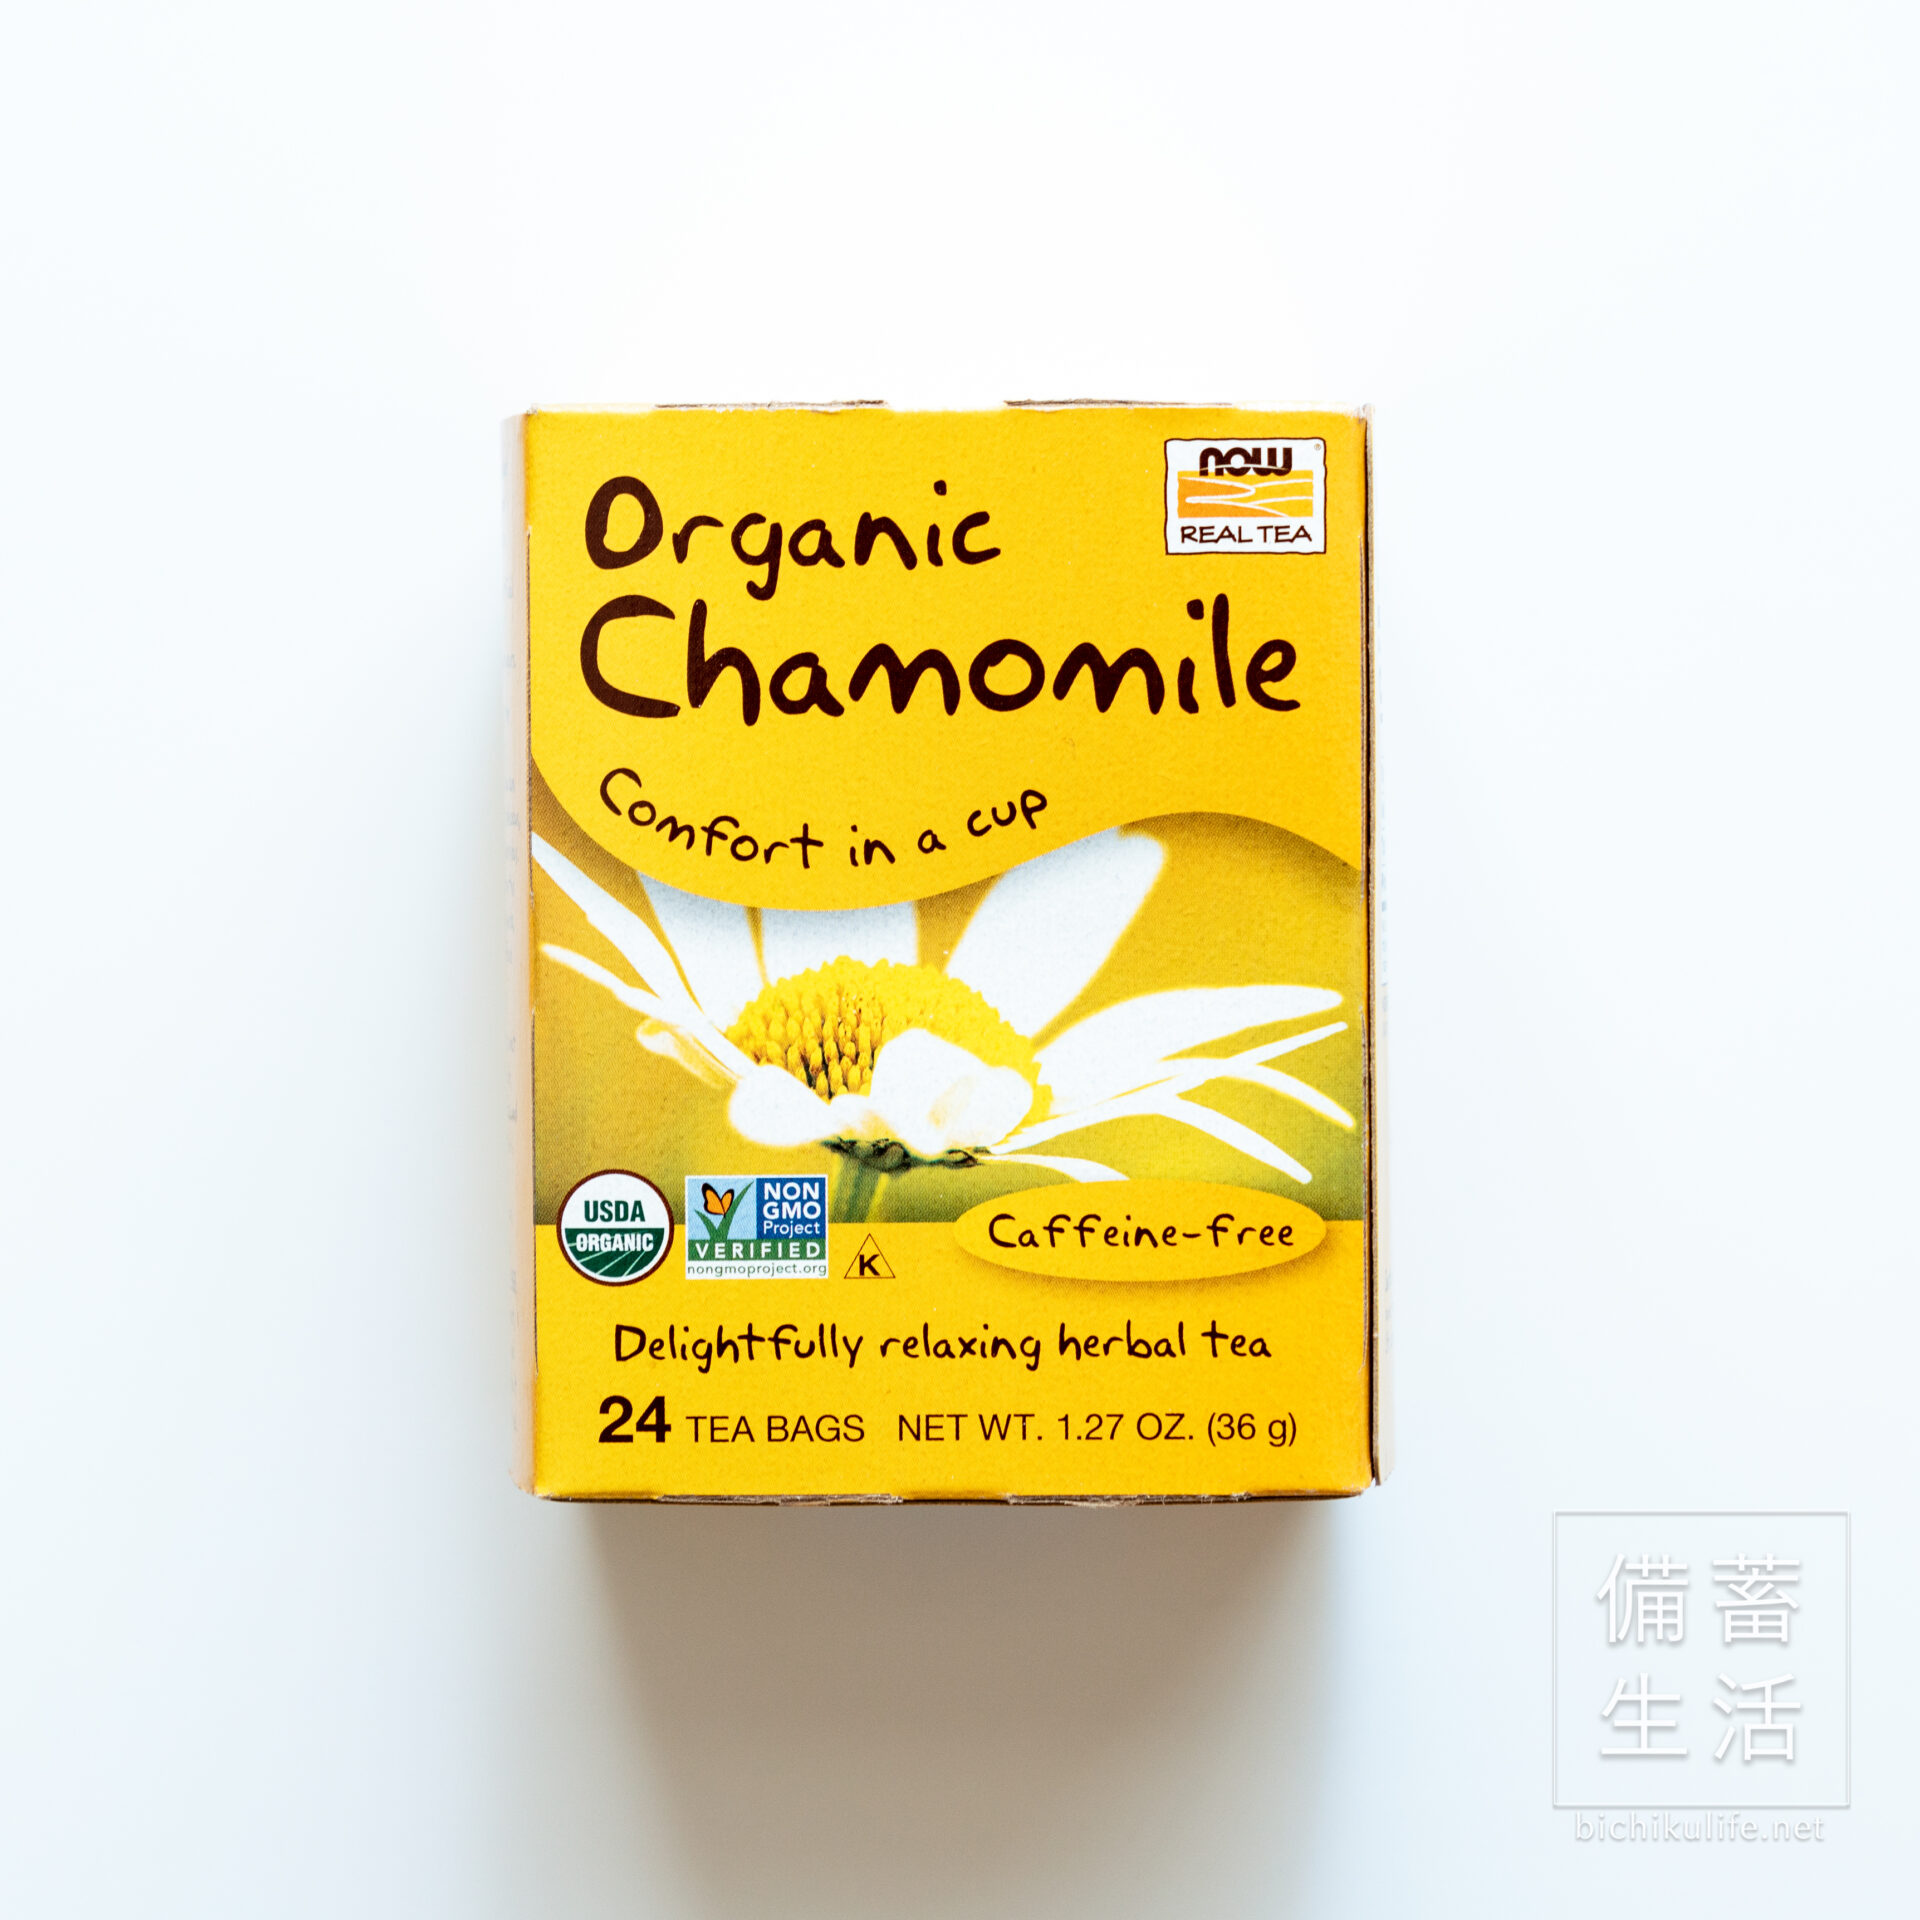 now Real Tea 有機カモミールティー